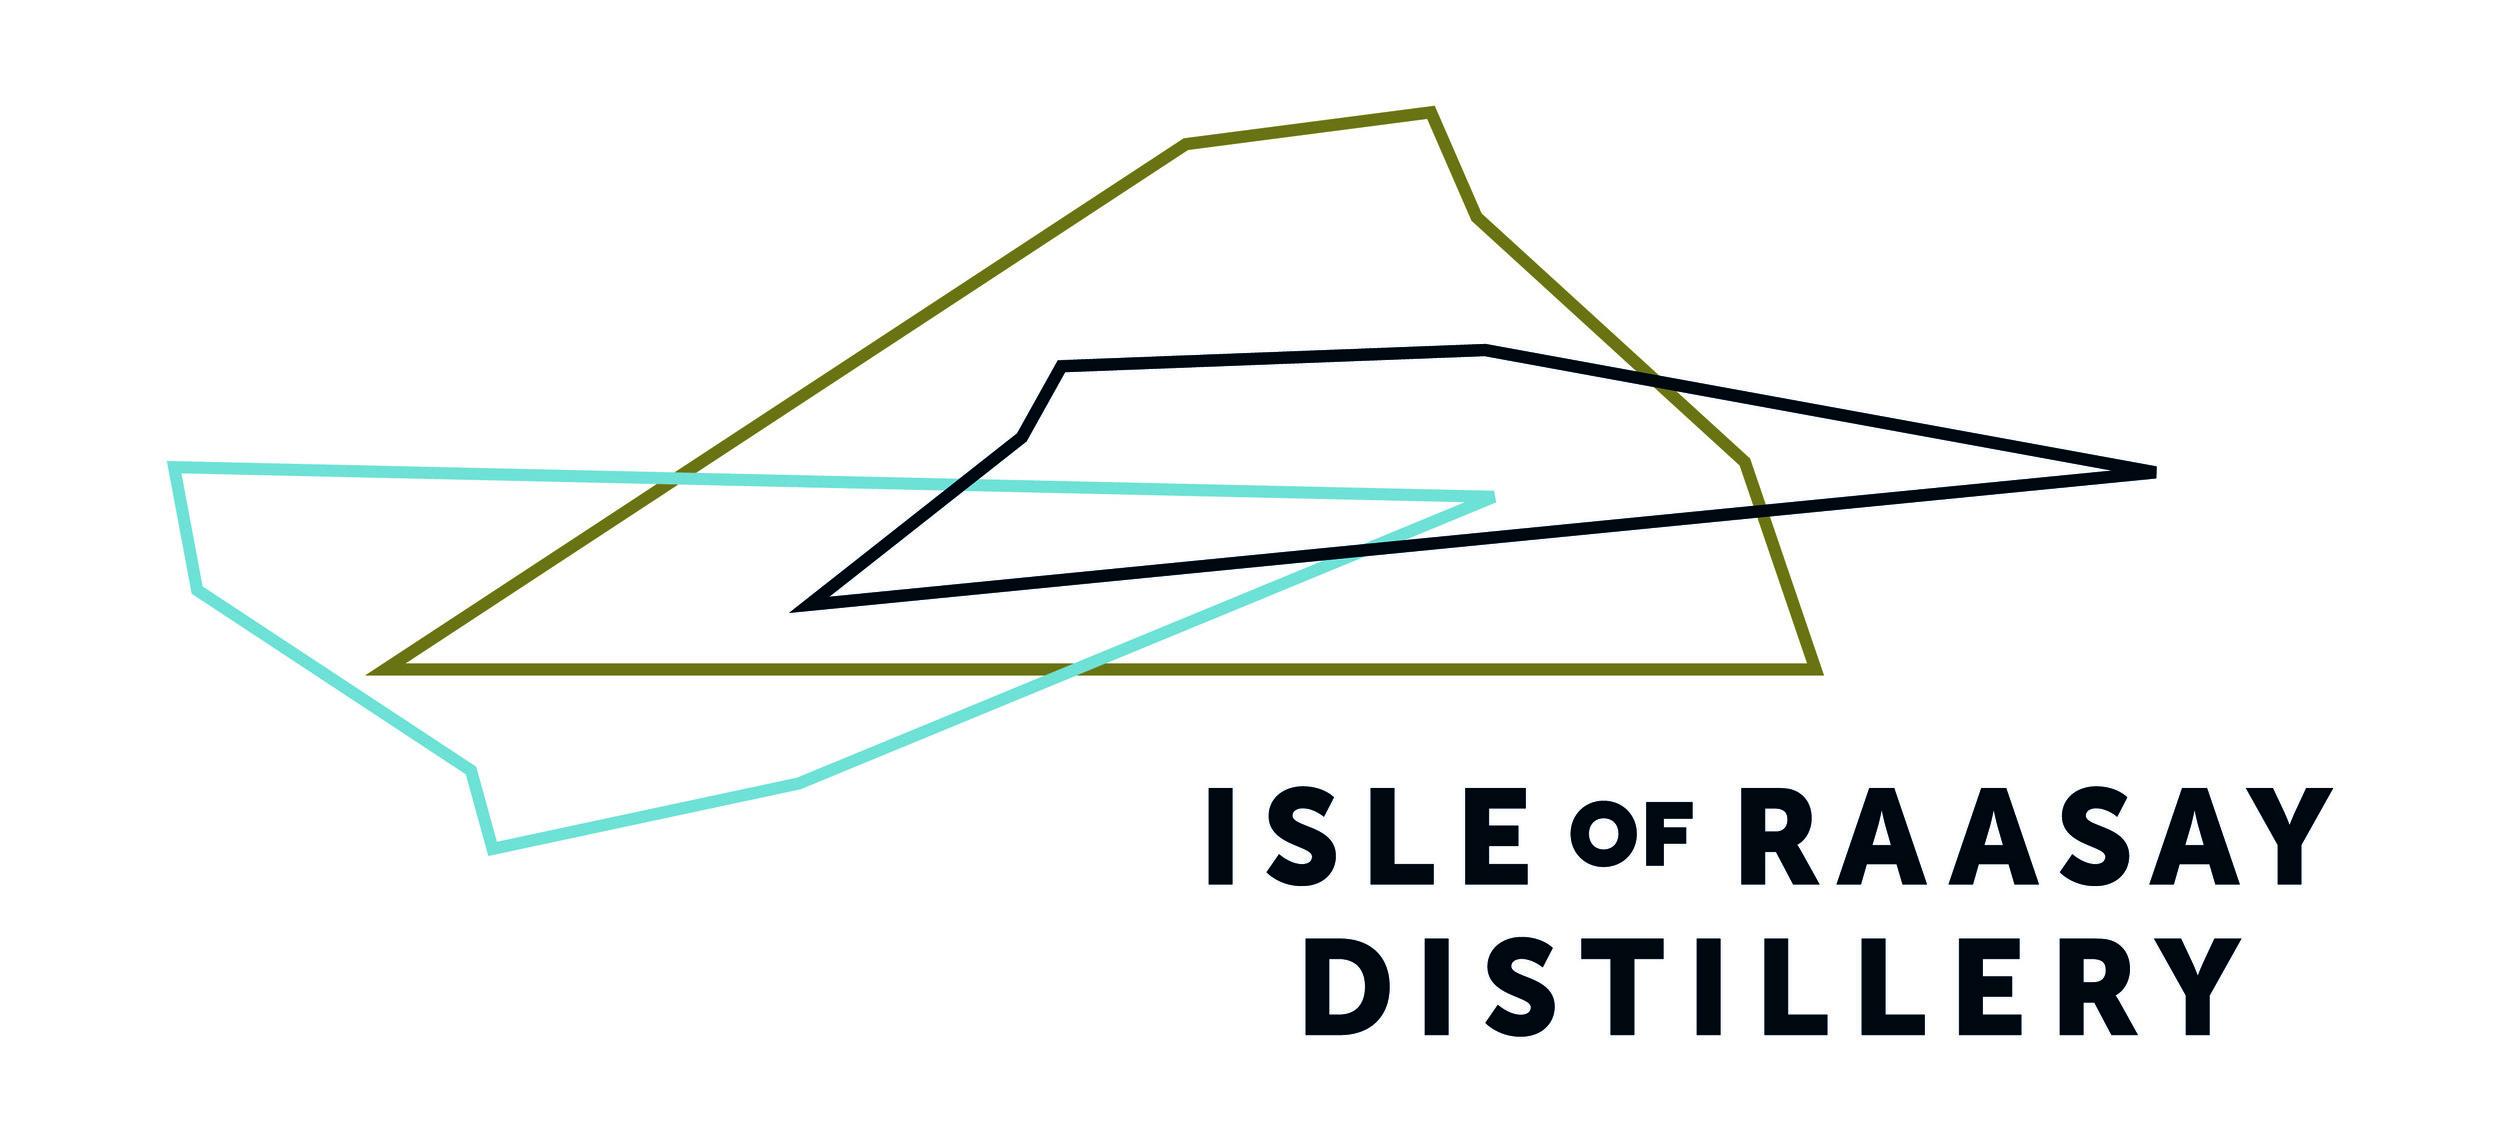 Isle of RaasayDistillery, lead sponsor of Women's Rugby coverage on Rugby People.